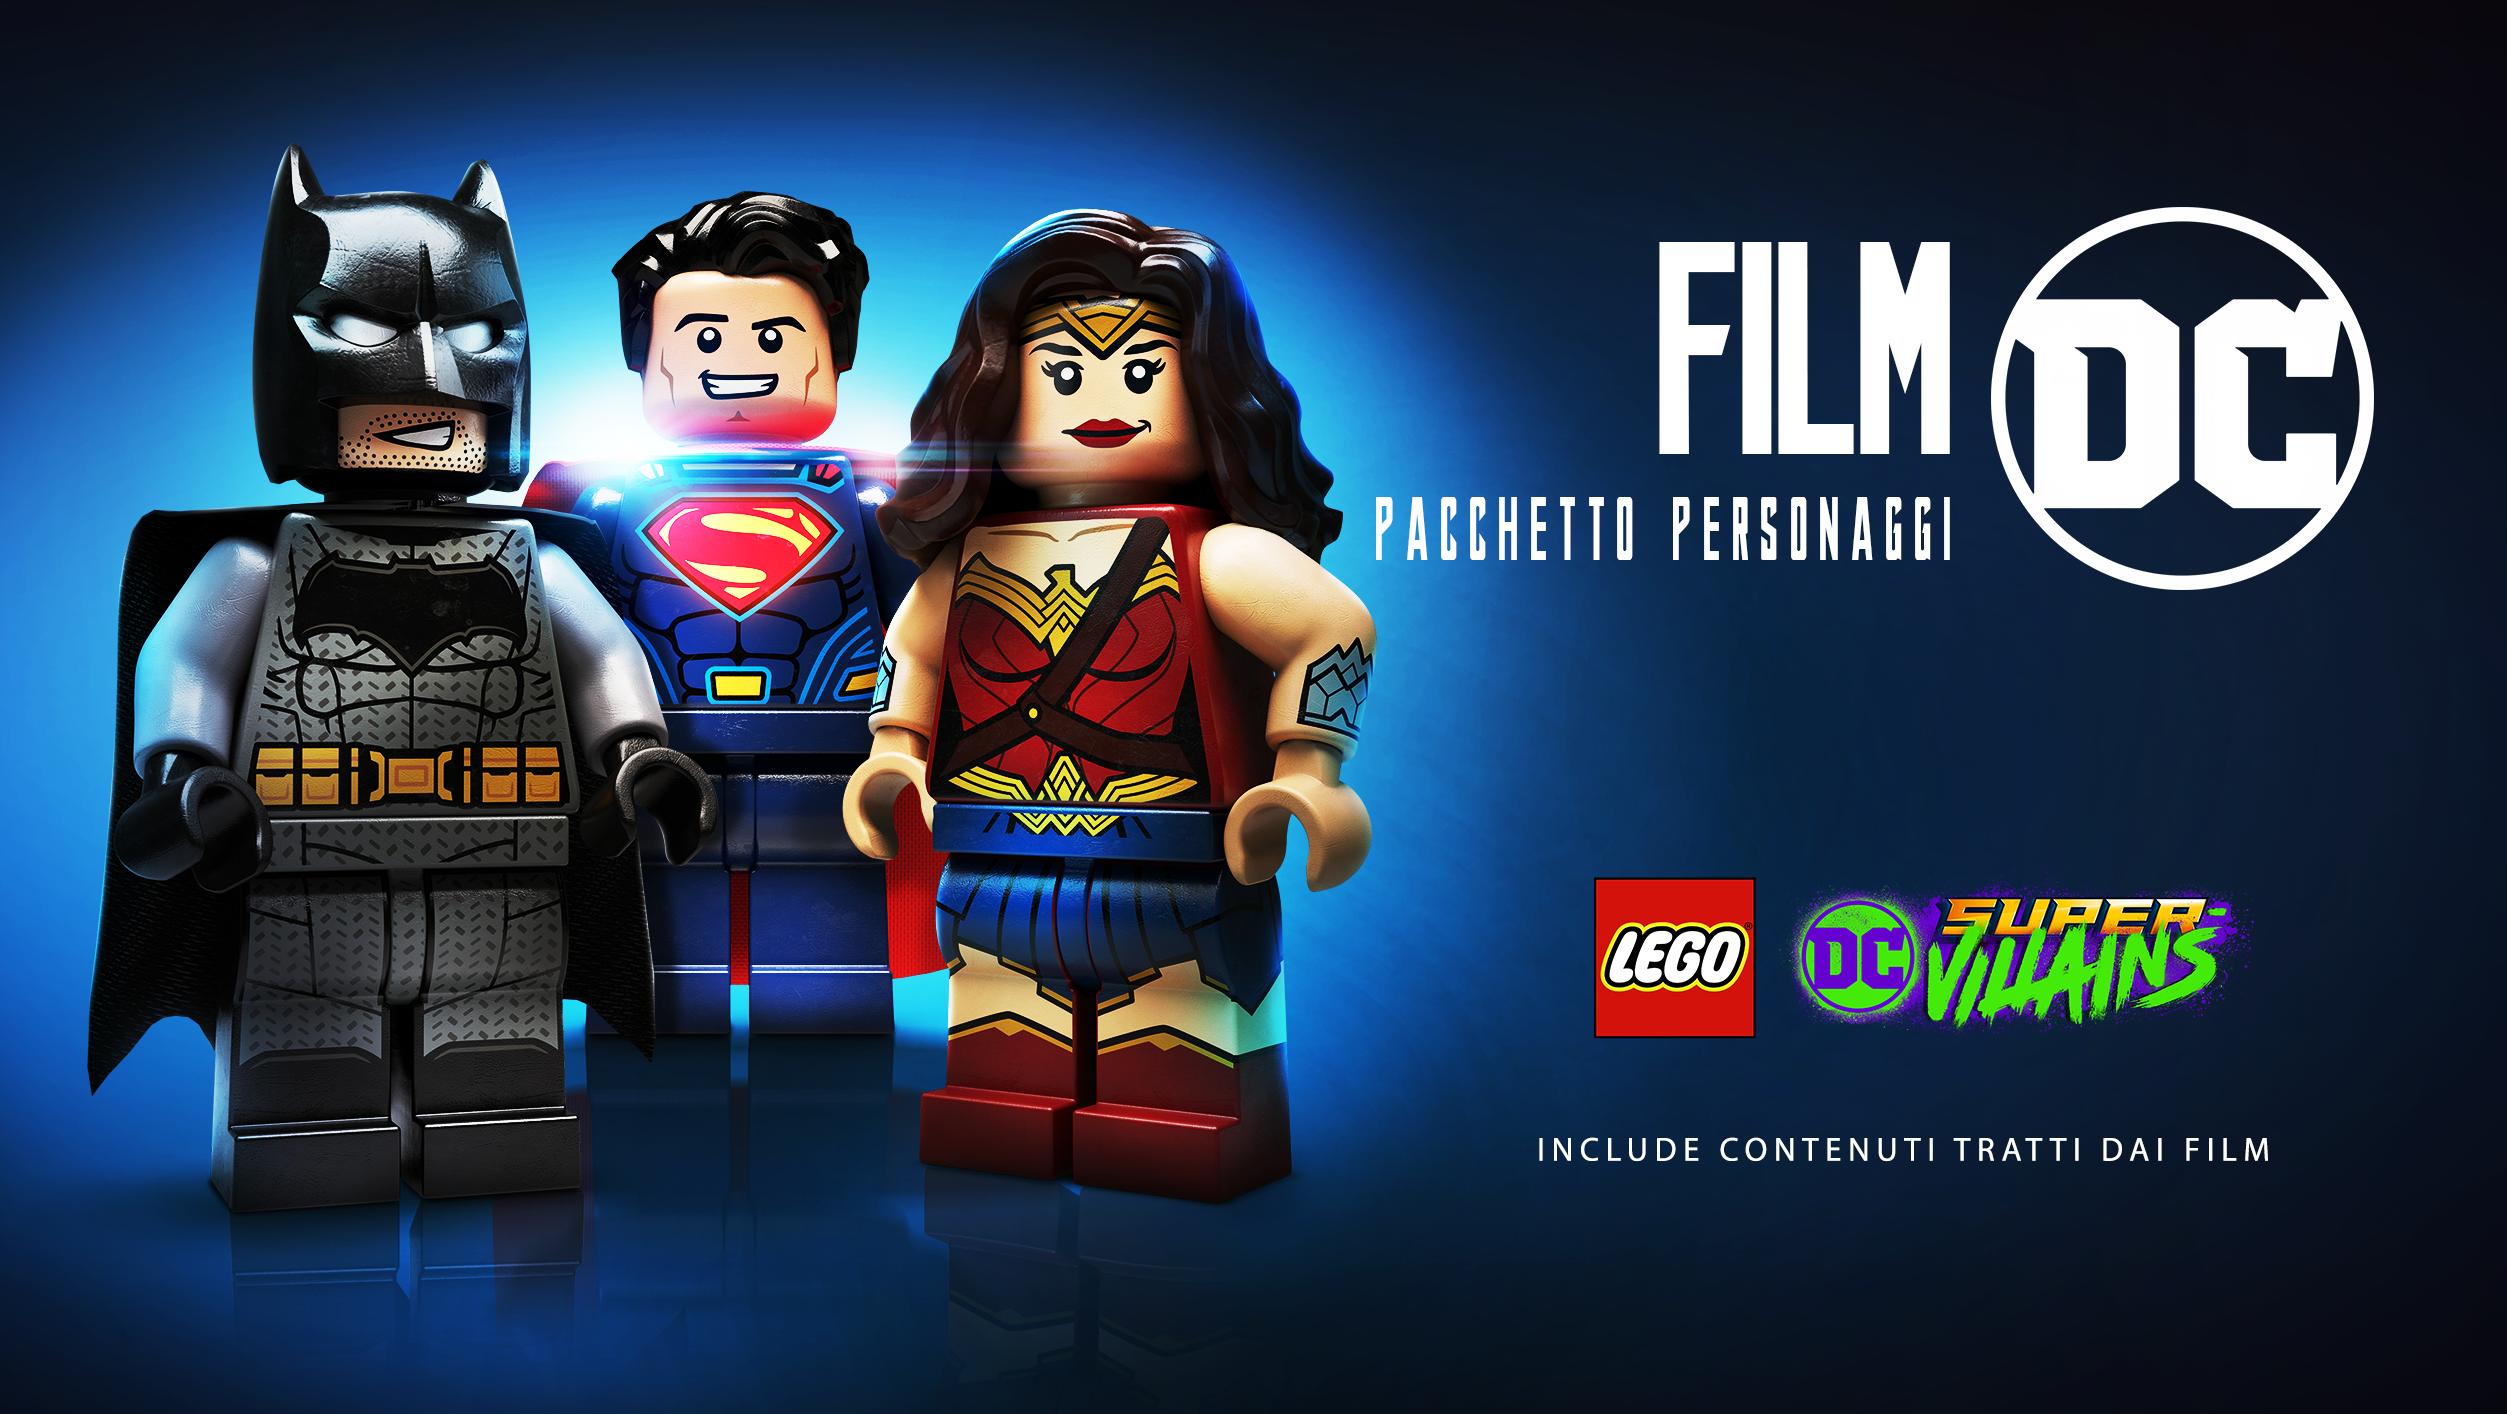 LEGODC Super-Villains: arrivato il pacchetto personaggi DC Movie thumbnail